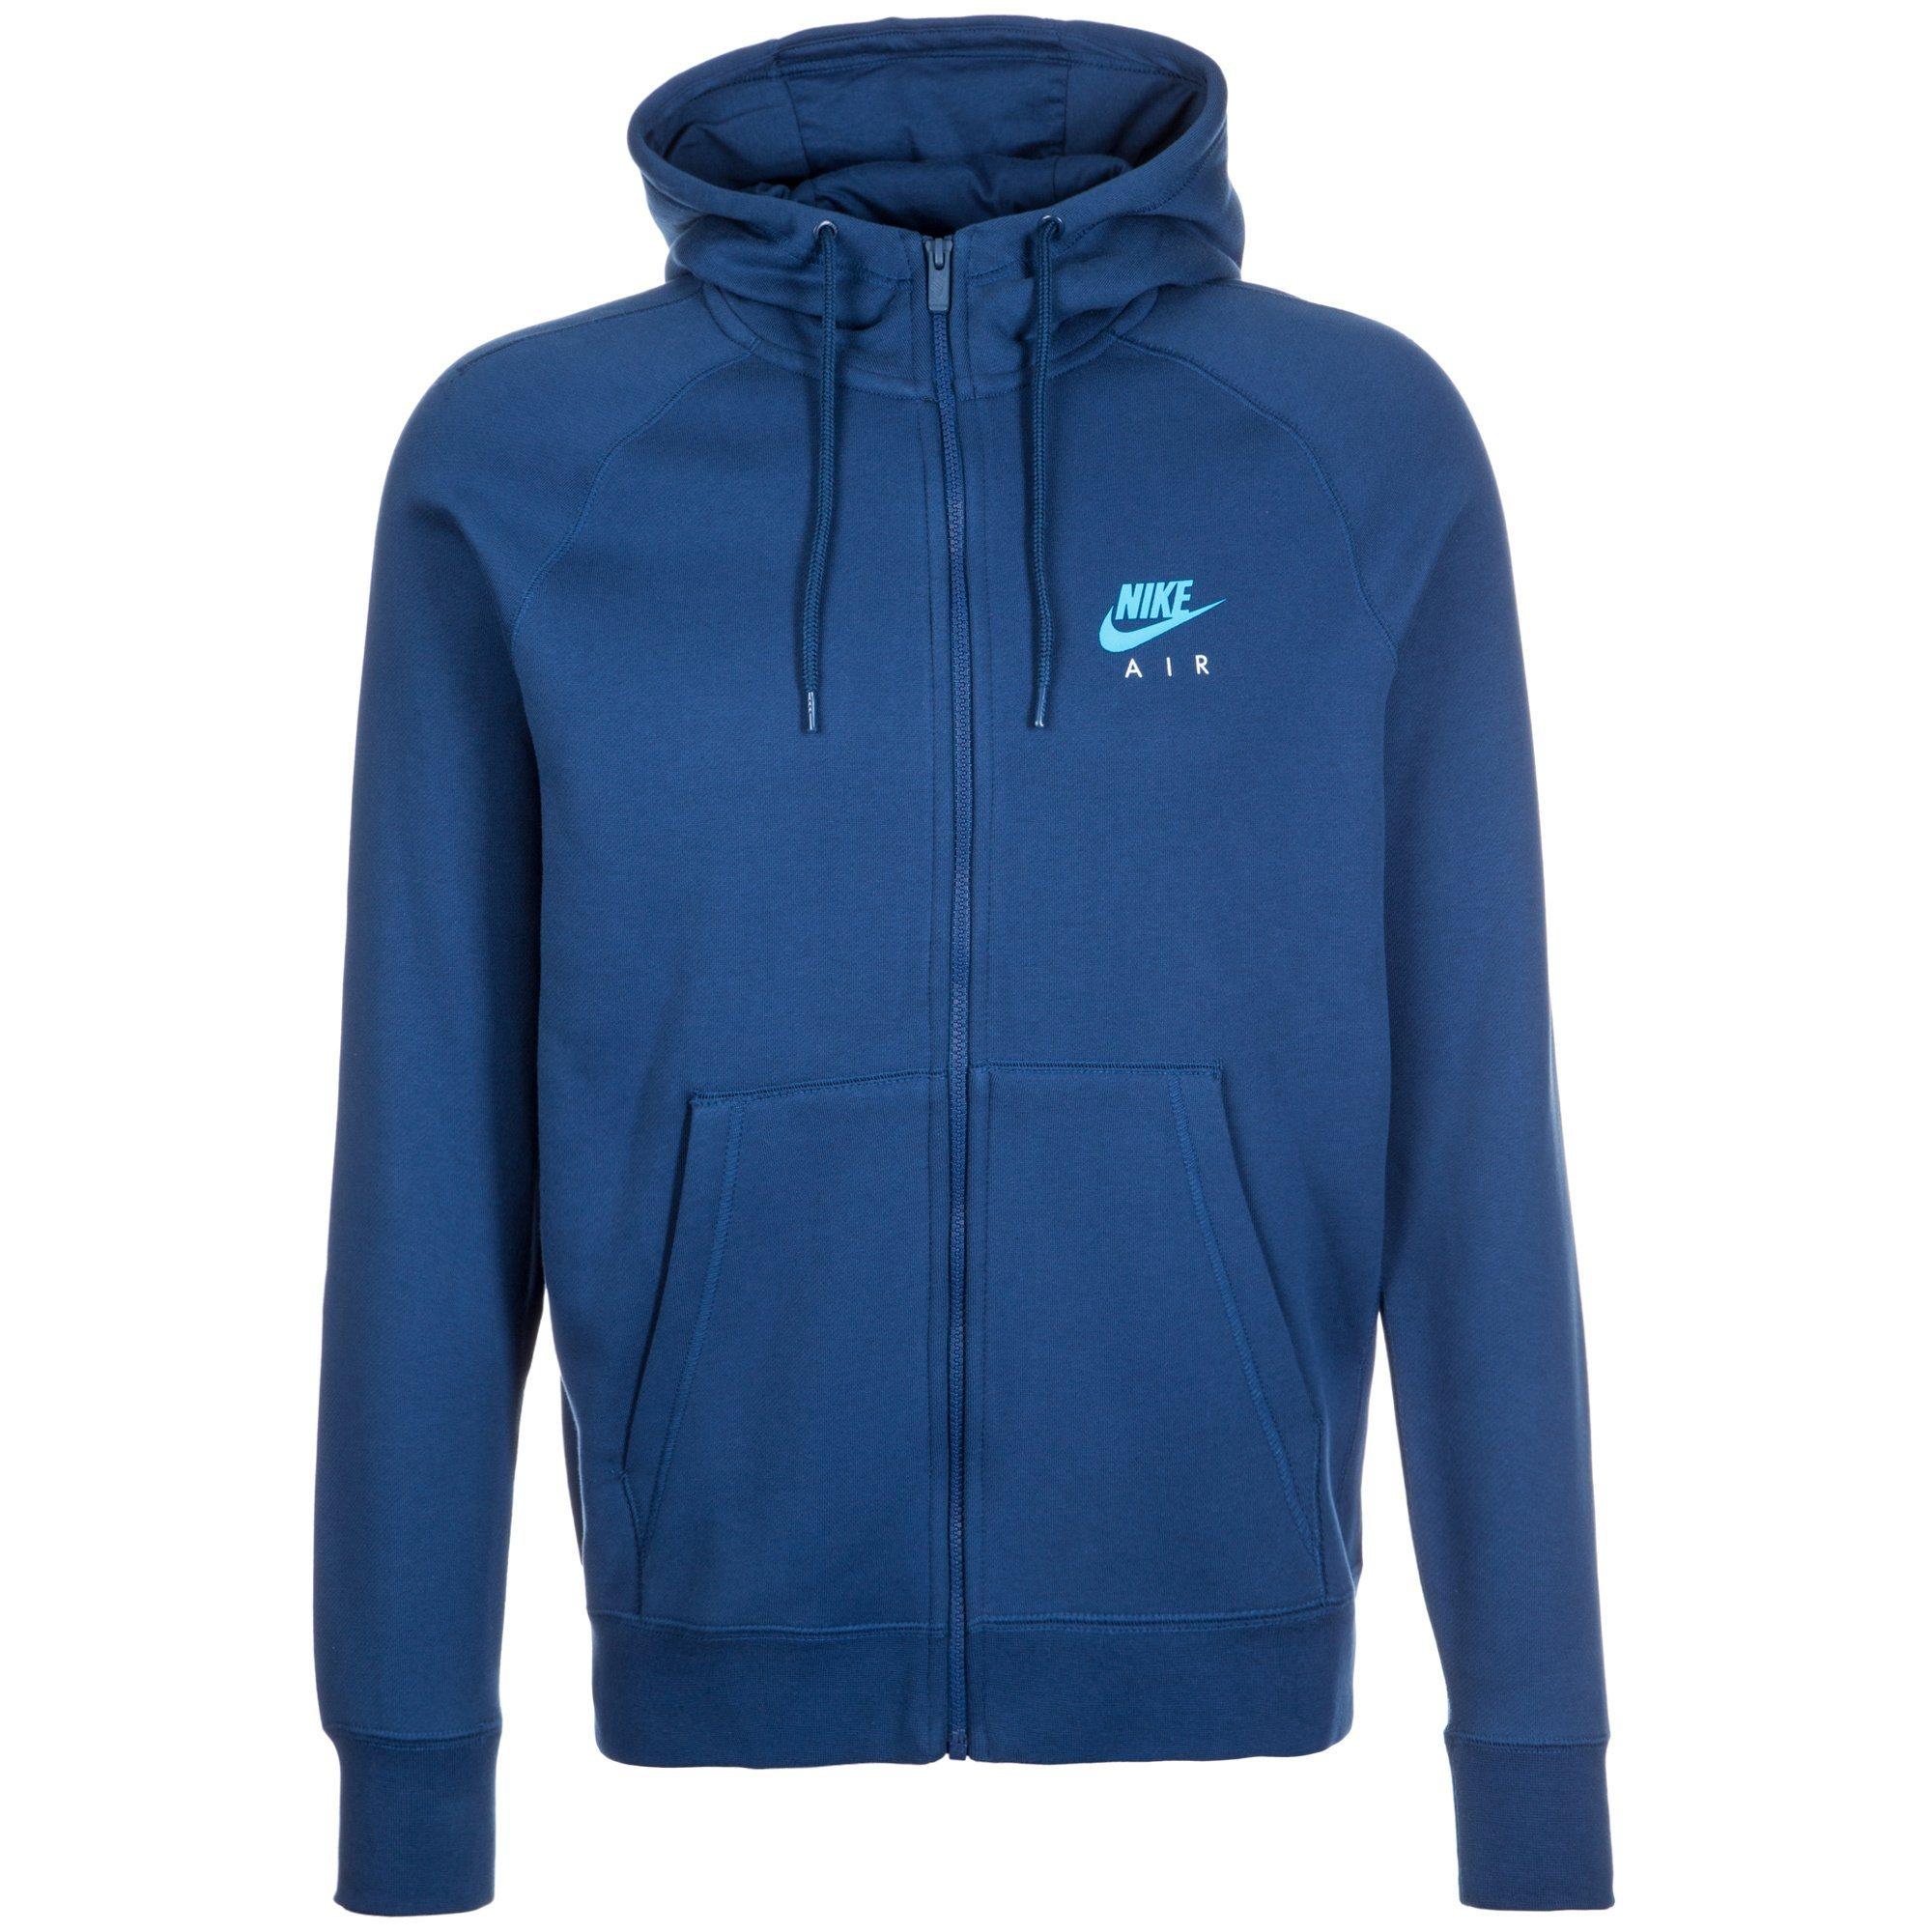 Nike Sportswear Air Fleece Kapuzenjacke Herren